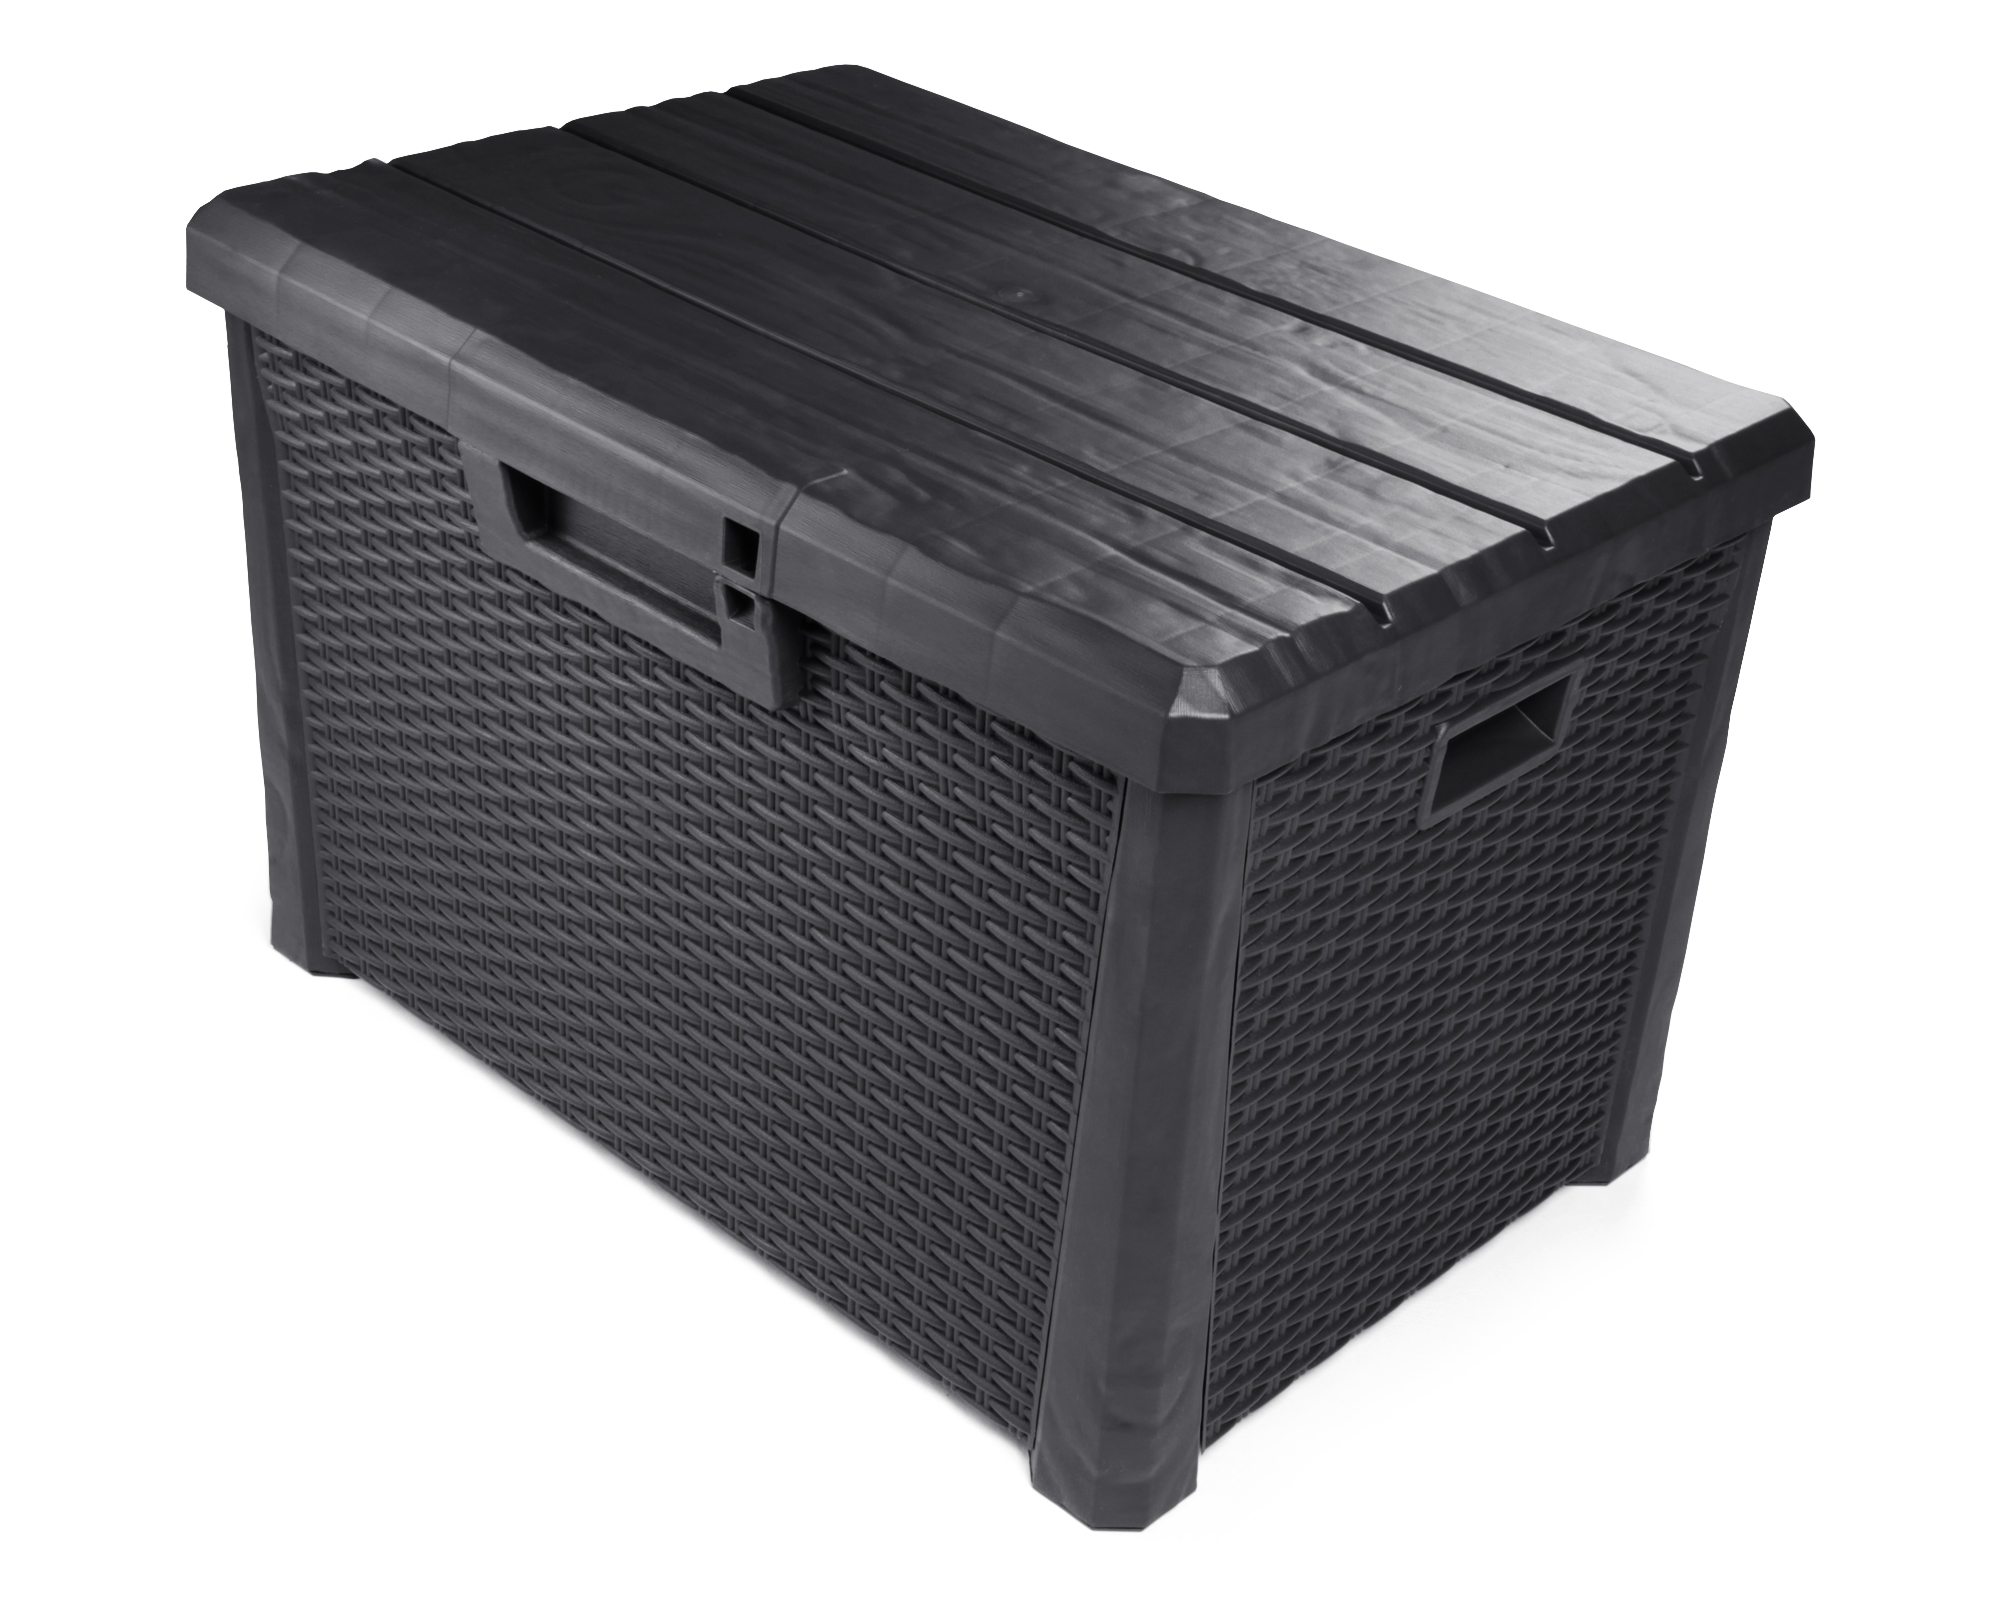 Sitztruhe Garten ondis24 kissenbox sitztruhe nevada kompakt 120 l günstig kaufen